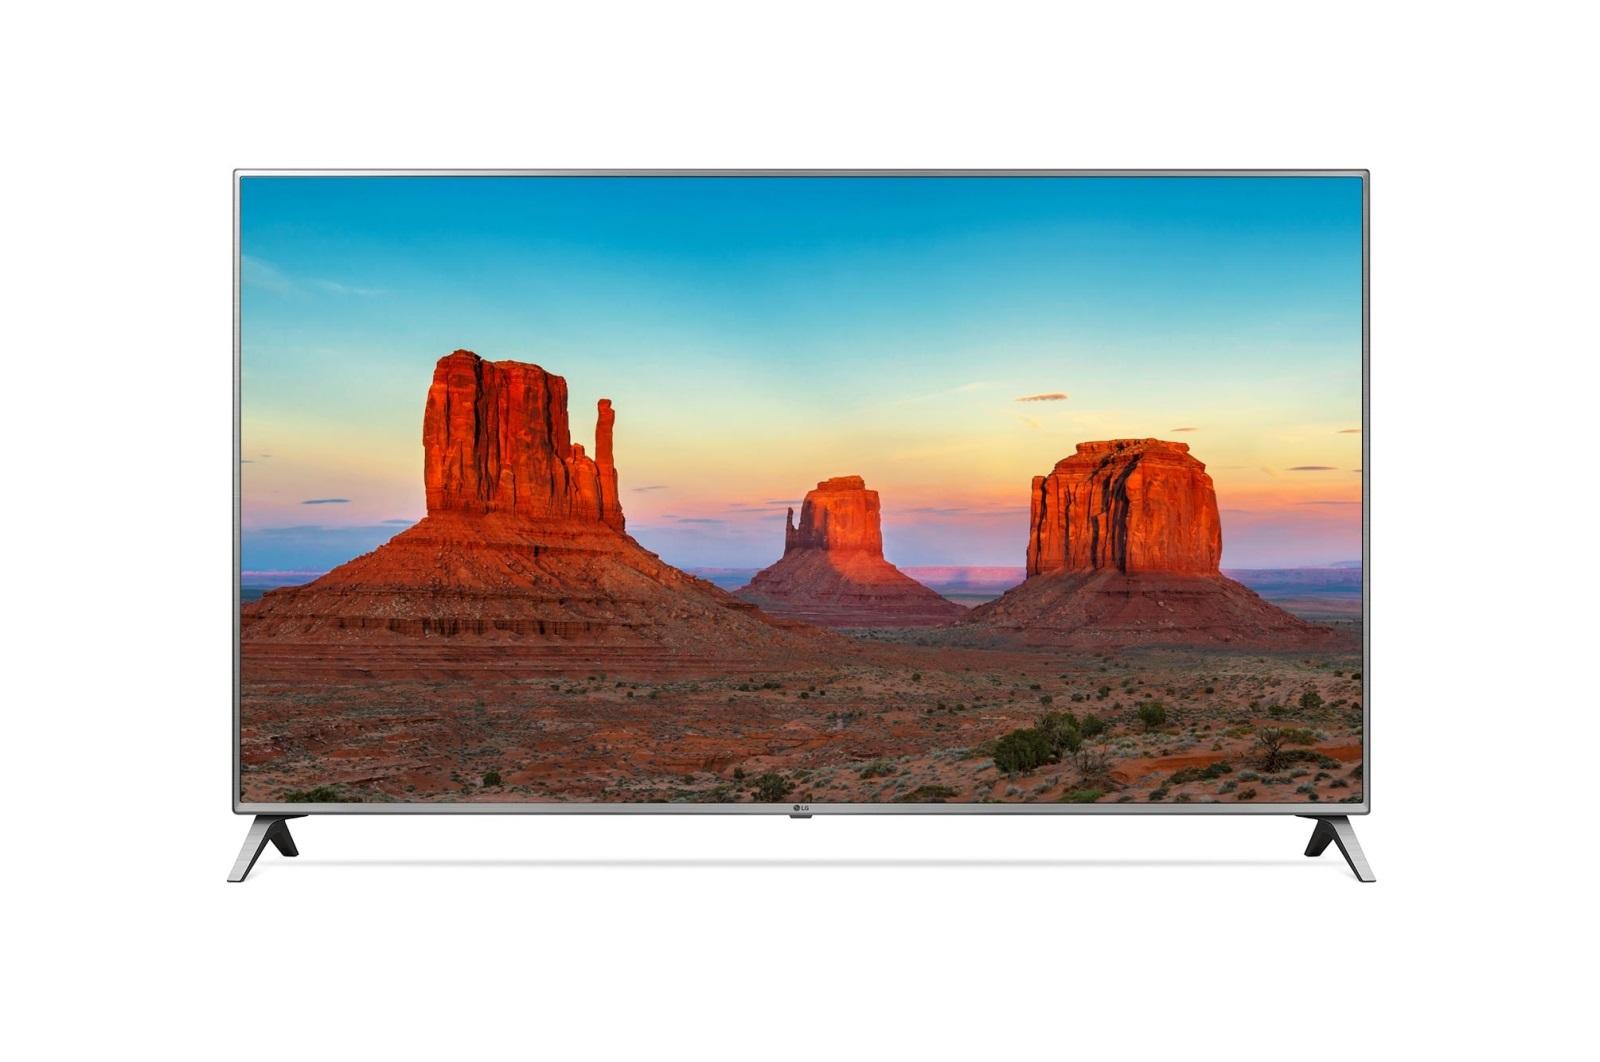 "LG 55UK6500MLA Smart LED TV; 55"" 139cm; UHD 3840x2160; WebOS 3.0; Wi-Fi, HBB-TV, Bluetooth, VESA; HDMI, USB, LAN; DVB-T2"